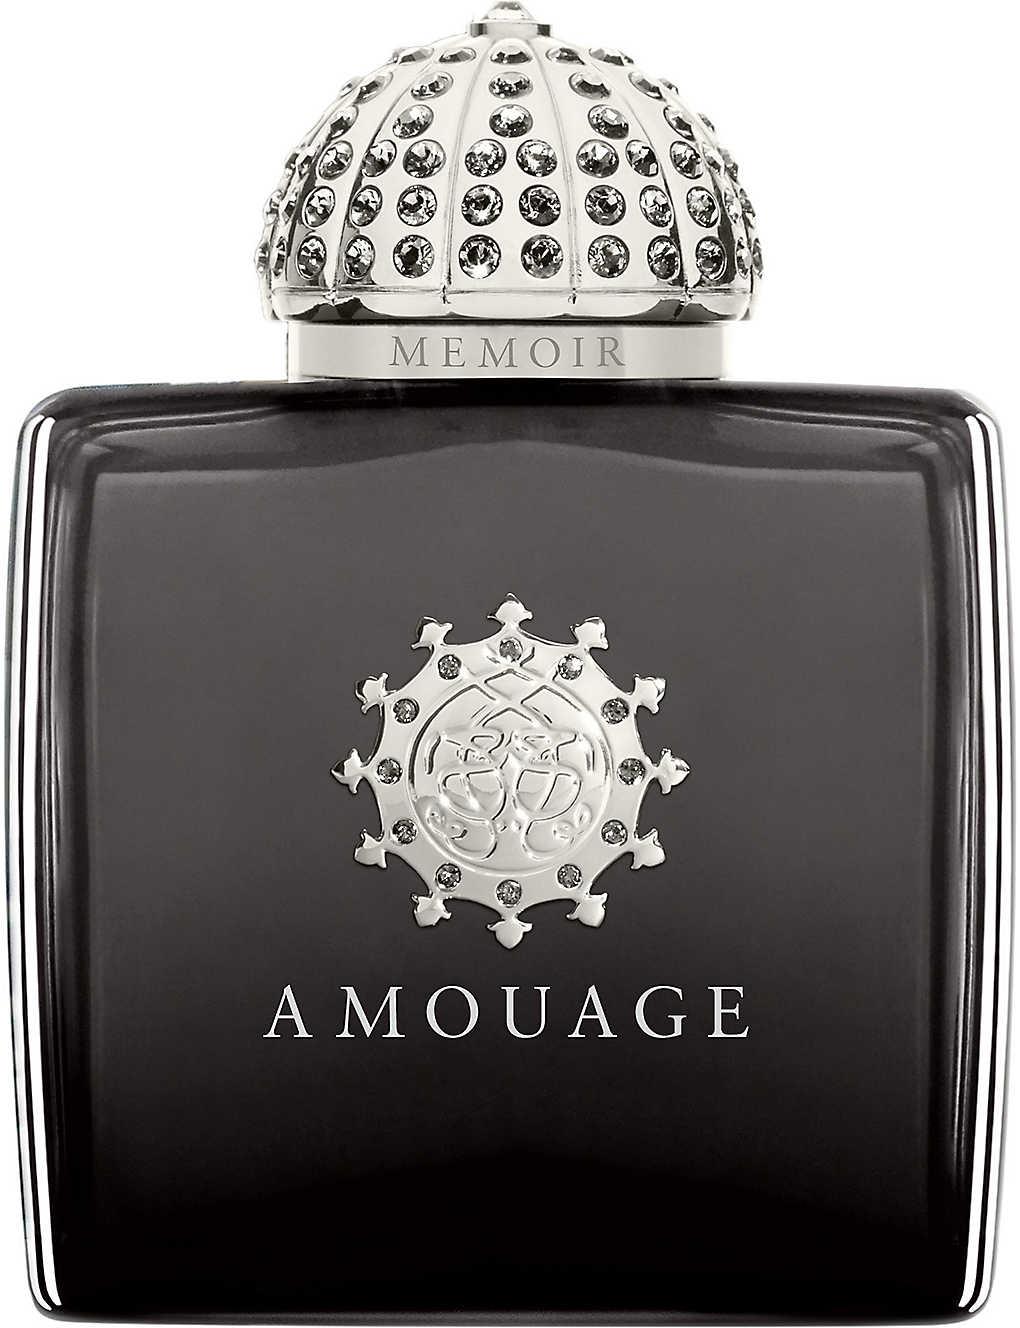 Amouage Memoir Woman Eau De Parfum 100ml Selfridgescom